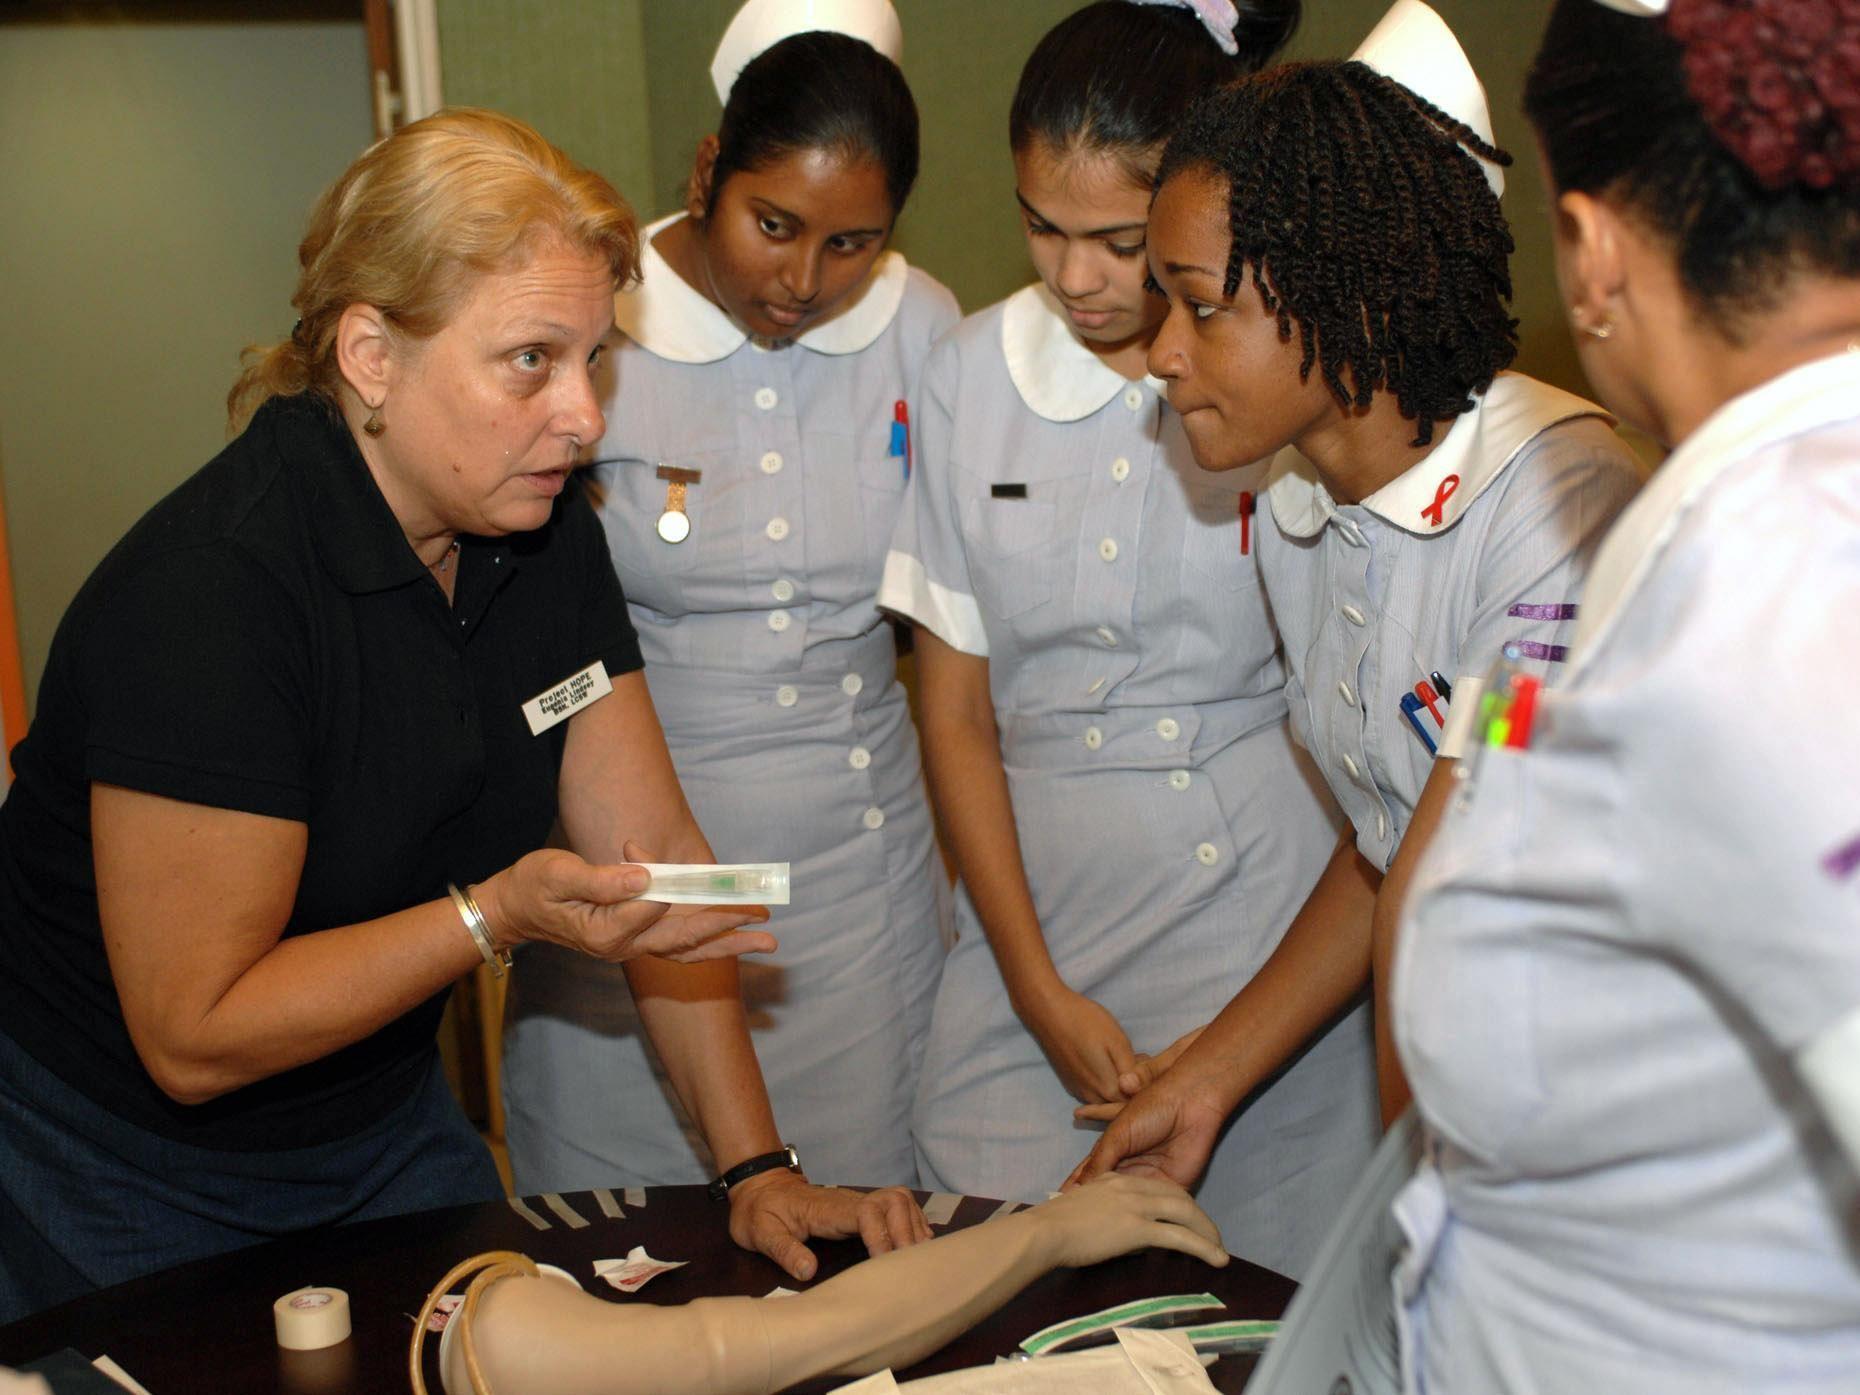 Digital Tools Improve Communication Skills for ESL Nursing